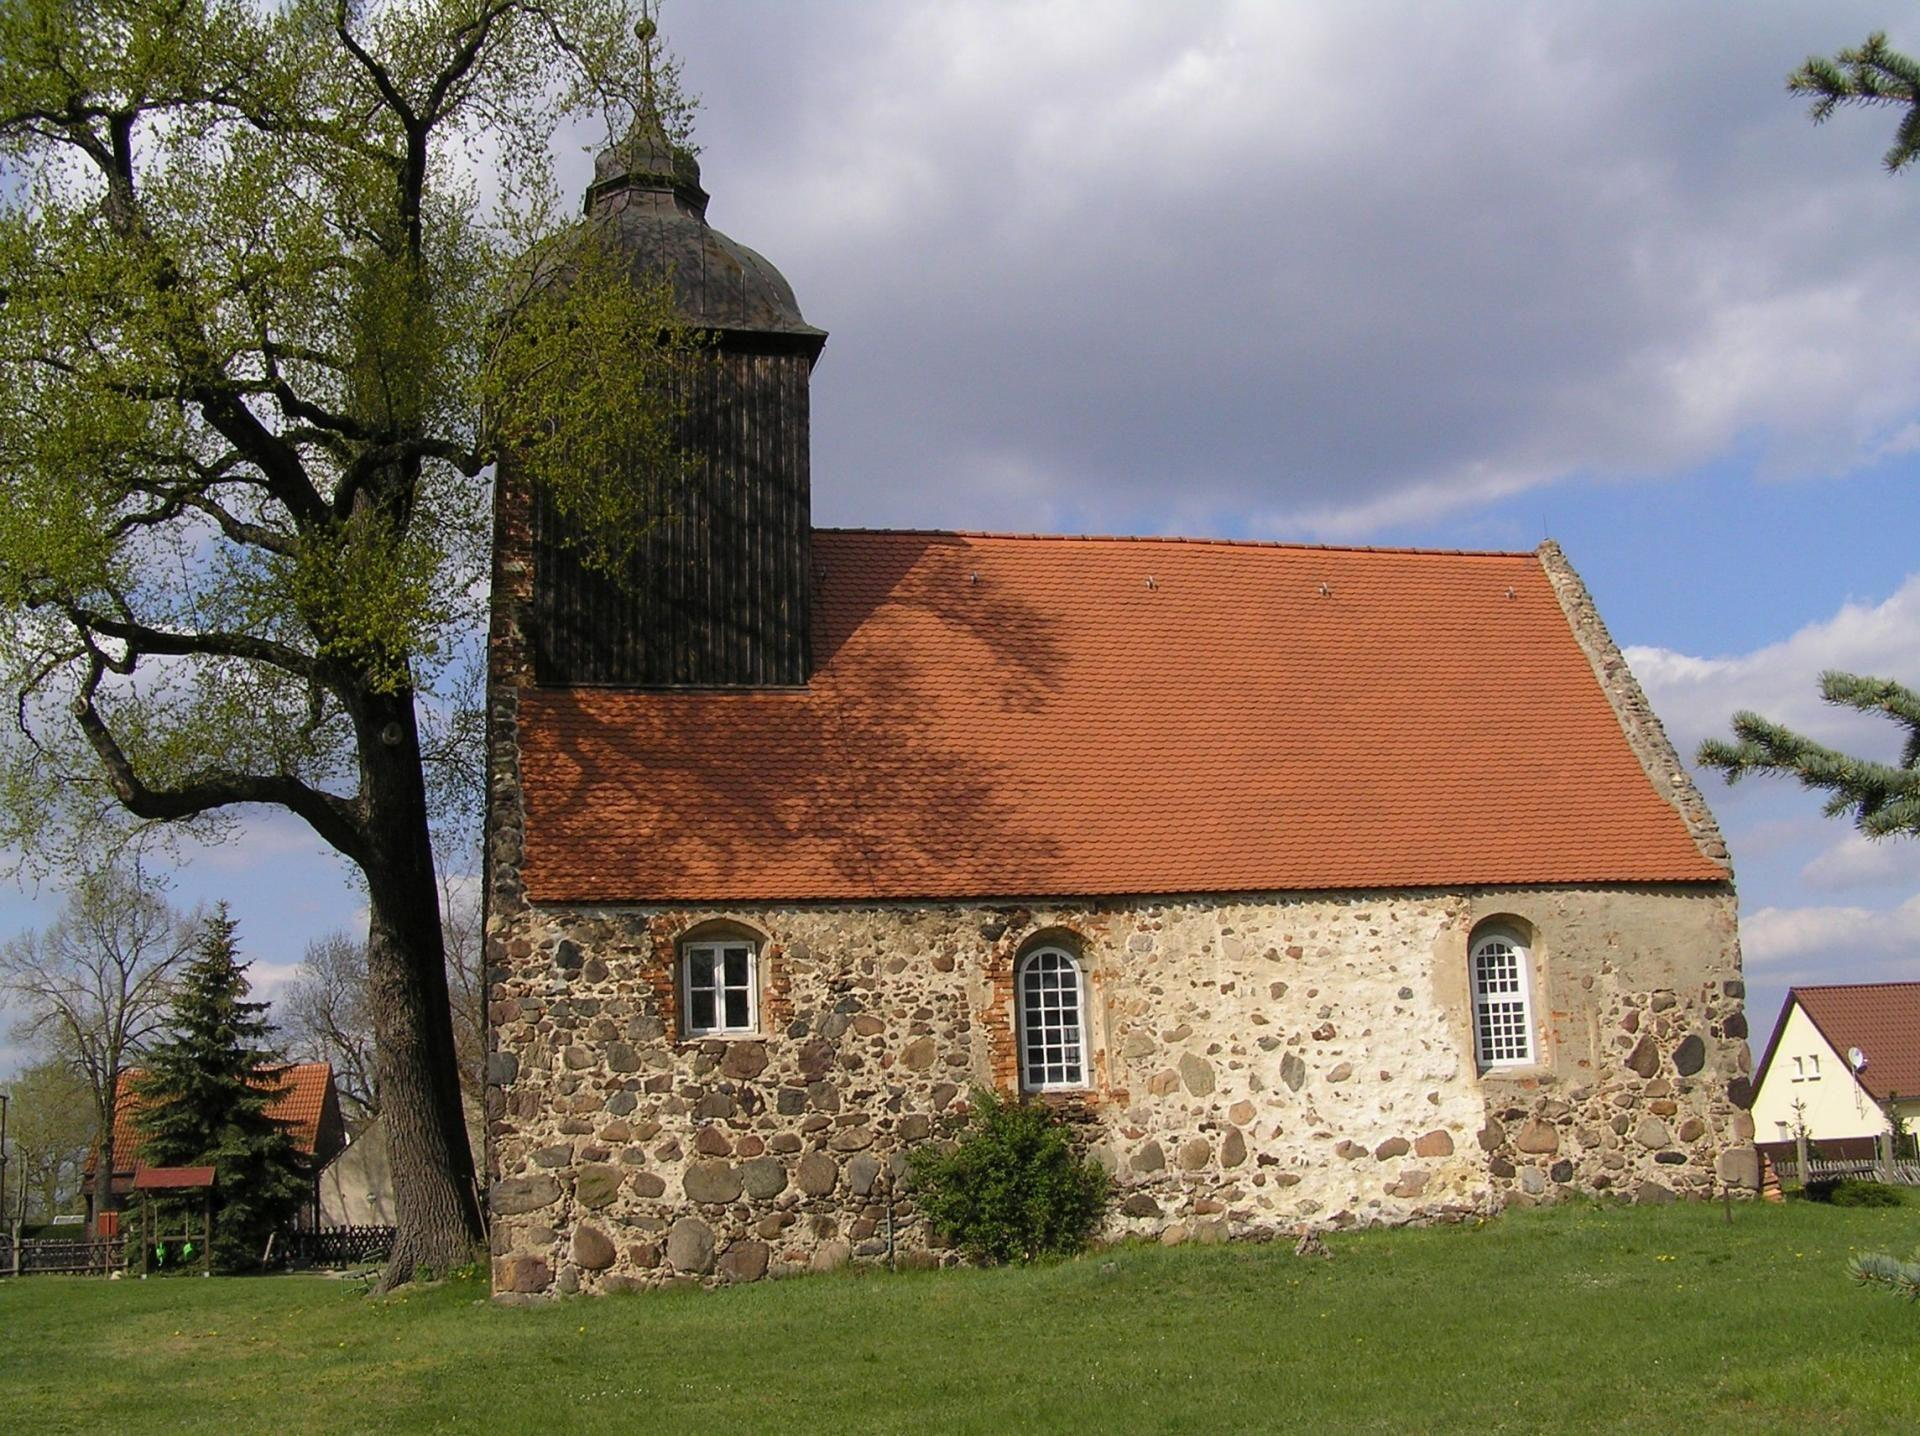 Egsdorf